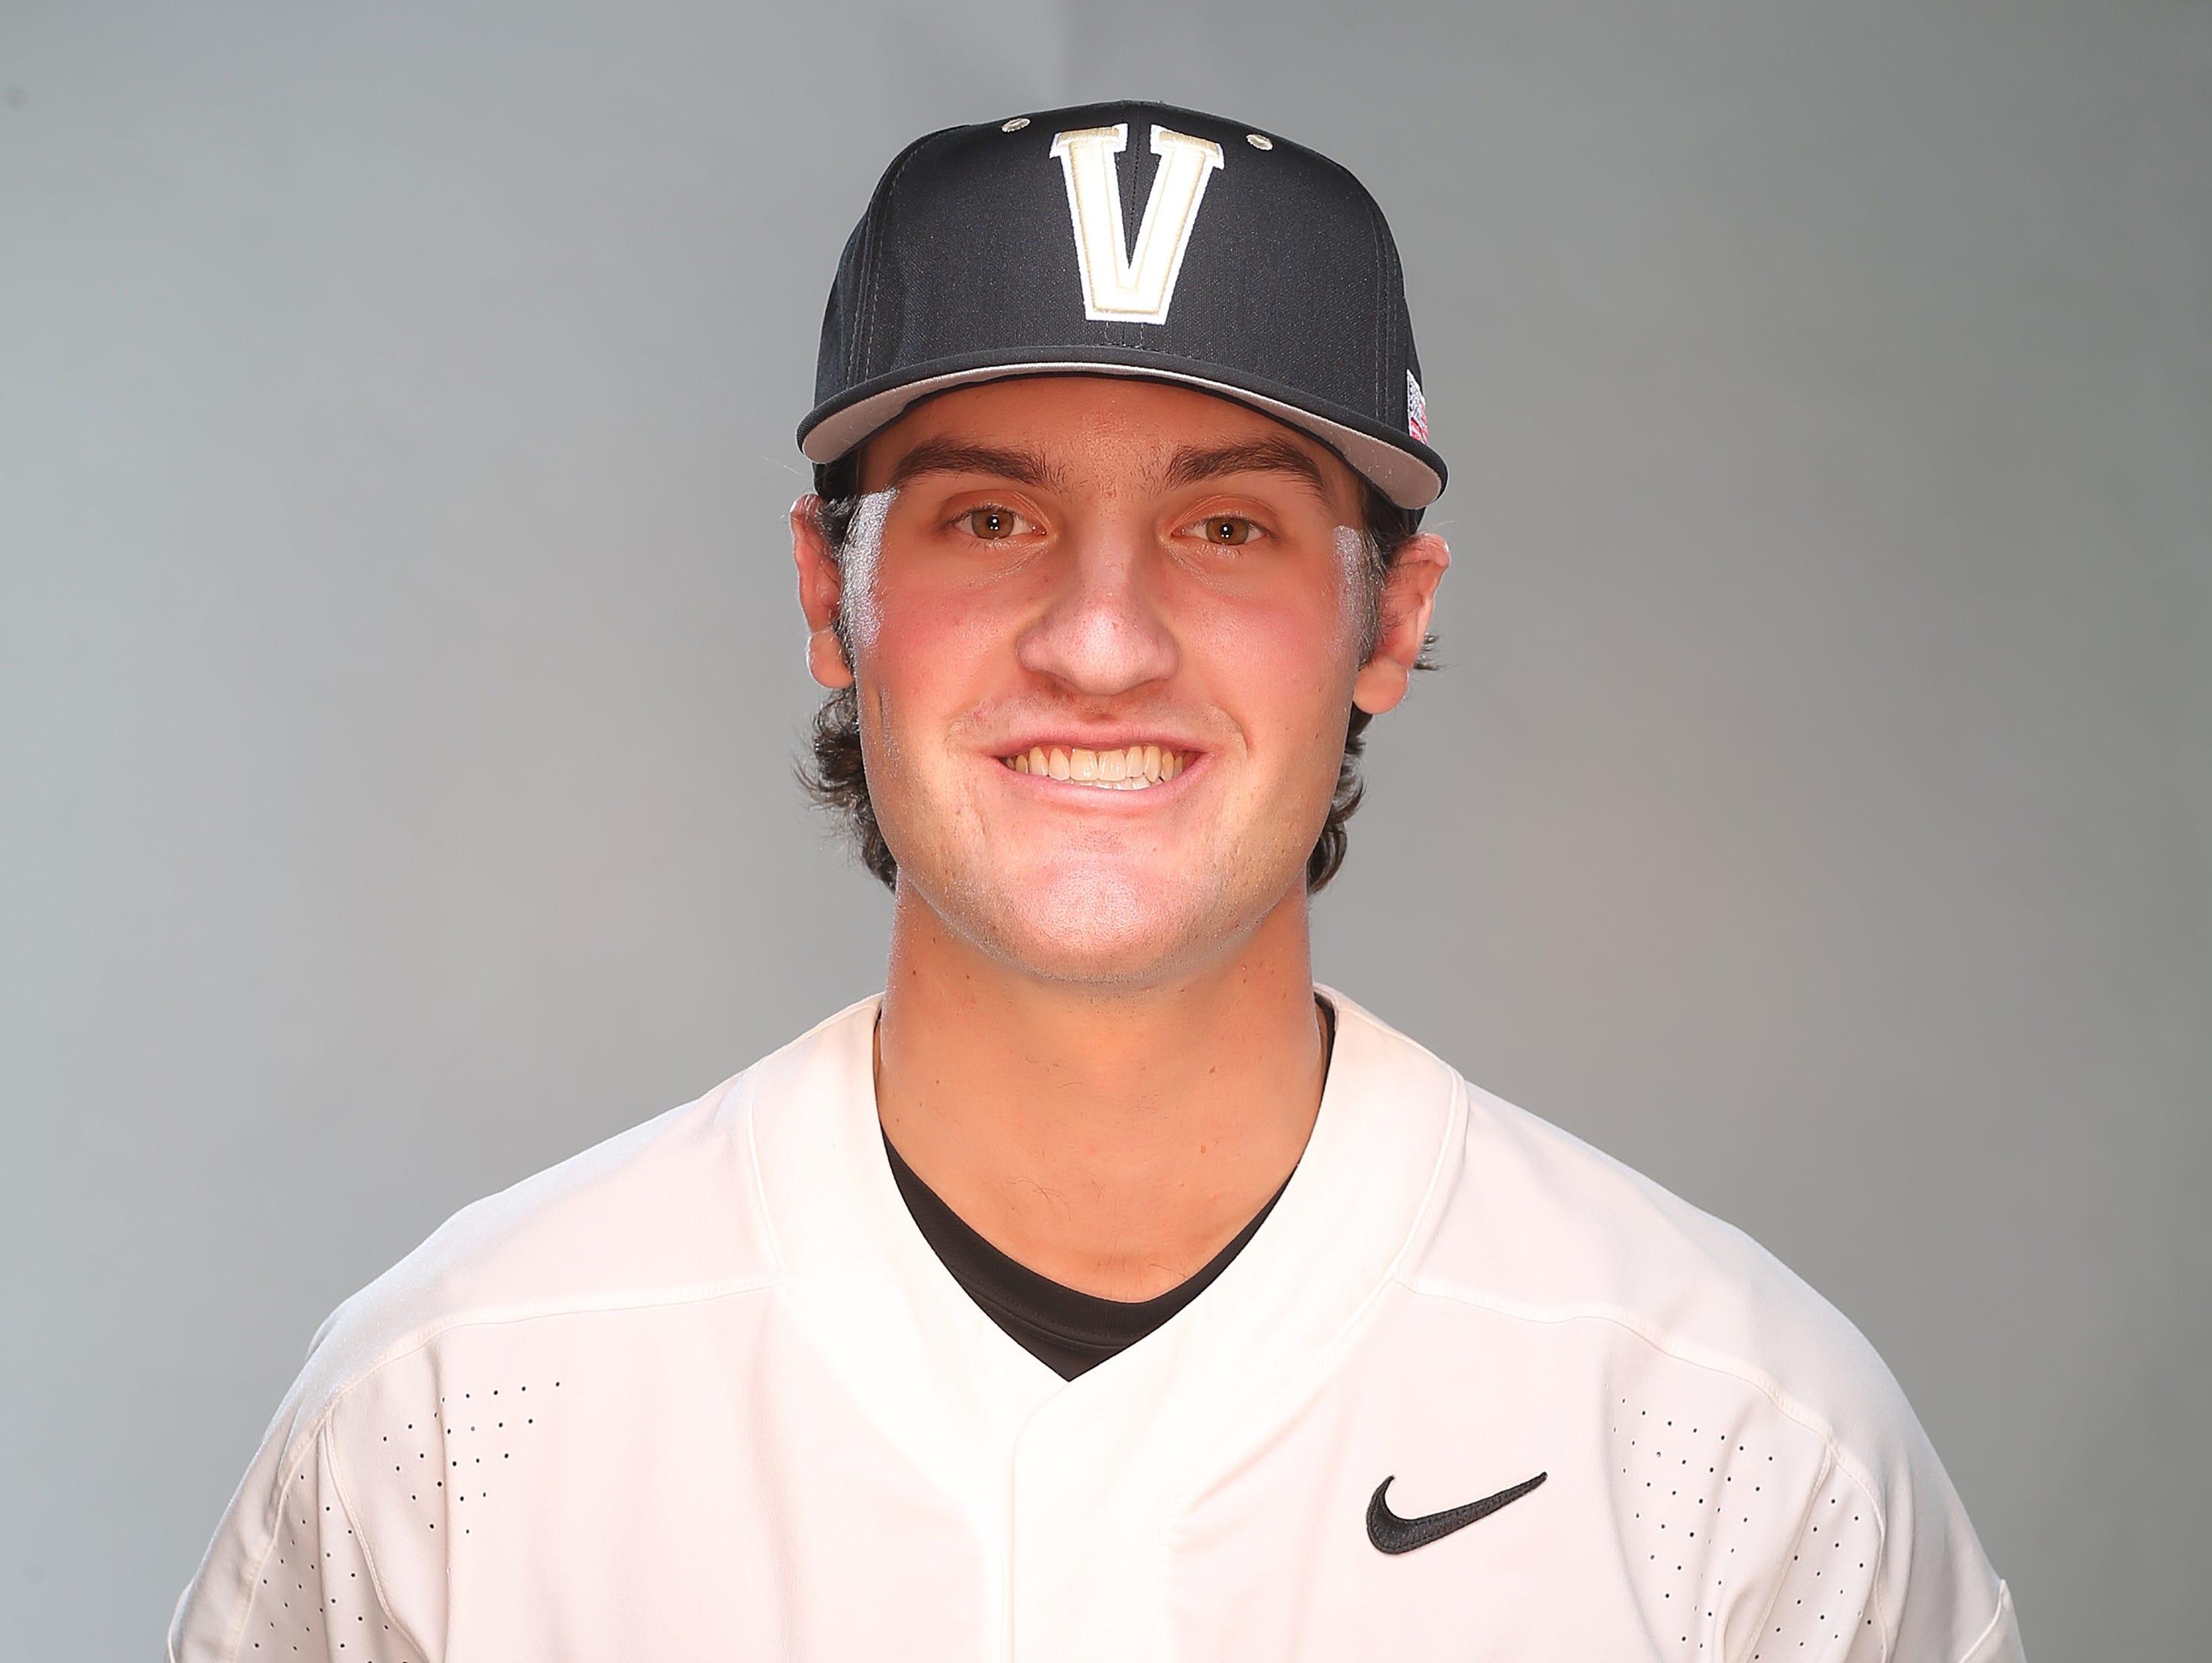 Vanderbilt baseball player Julian Infante in 2017.